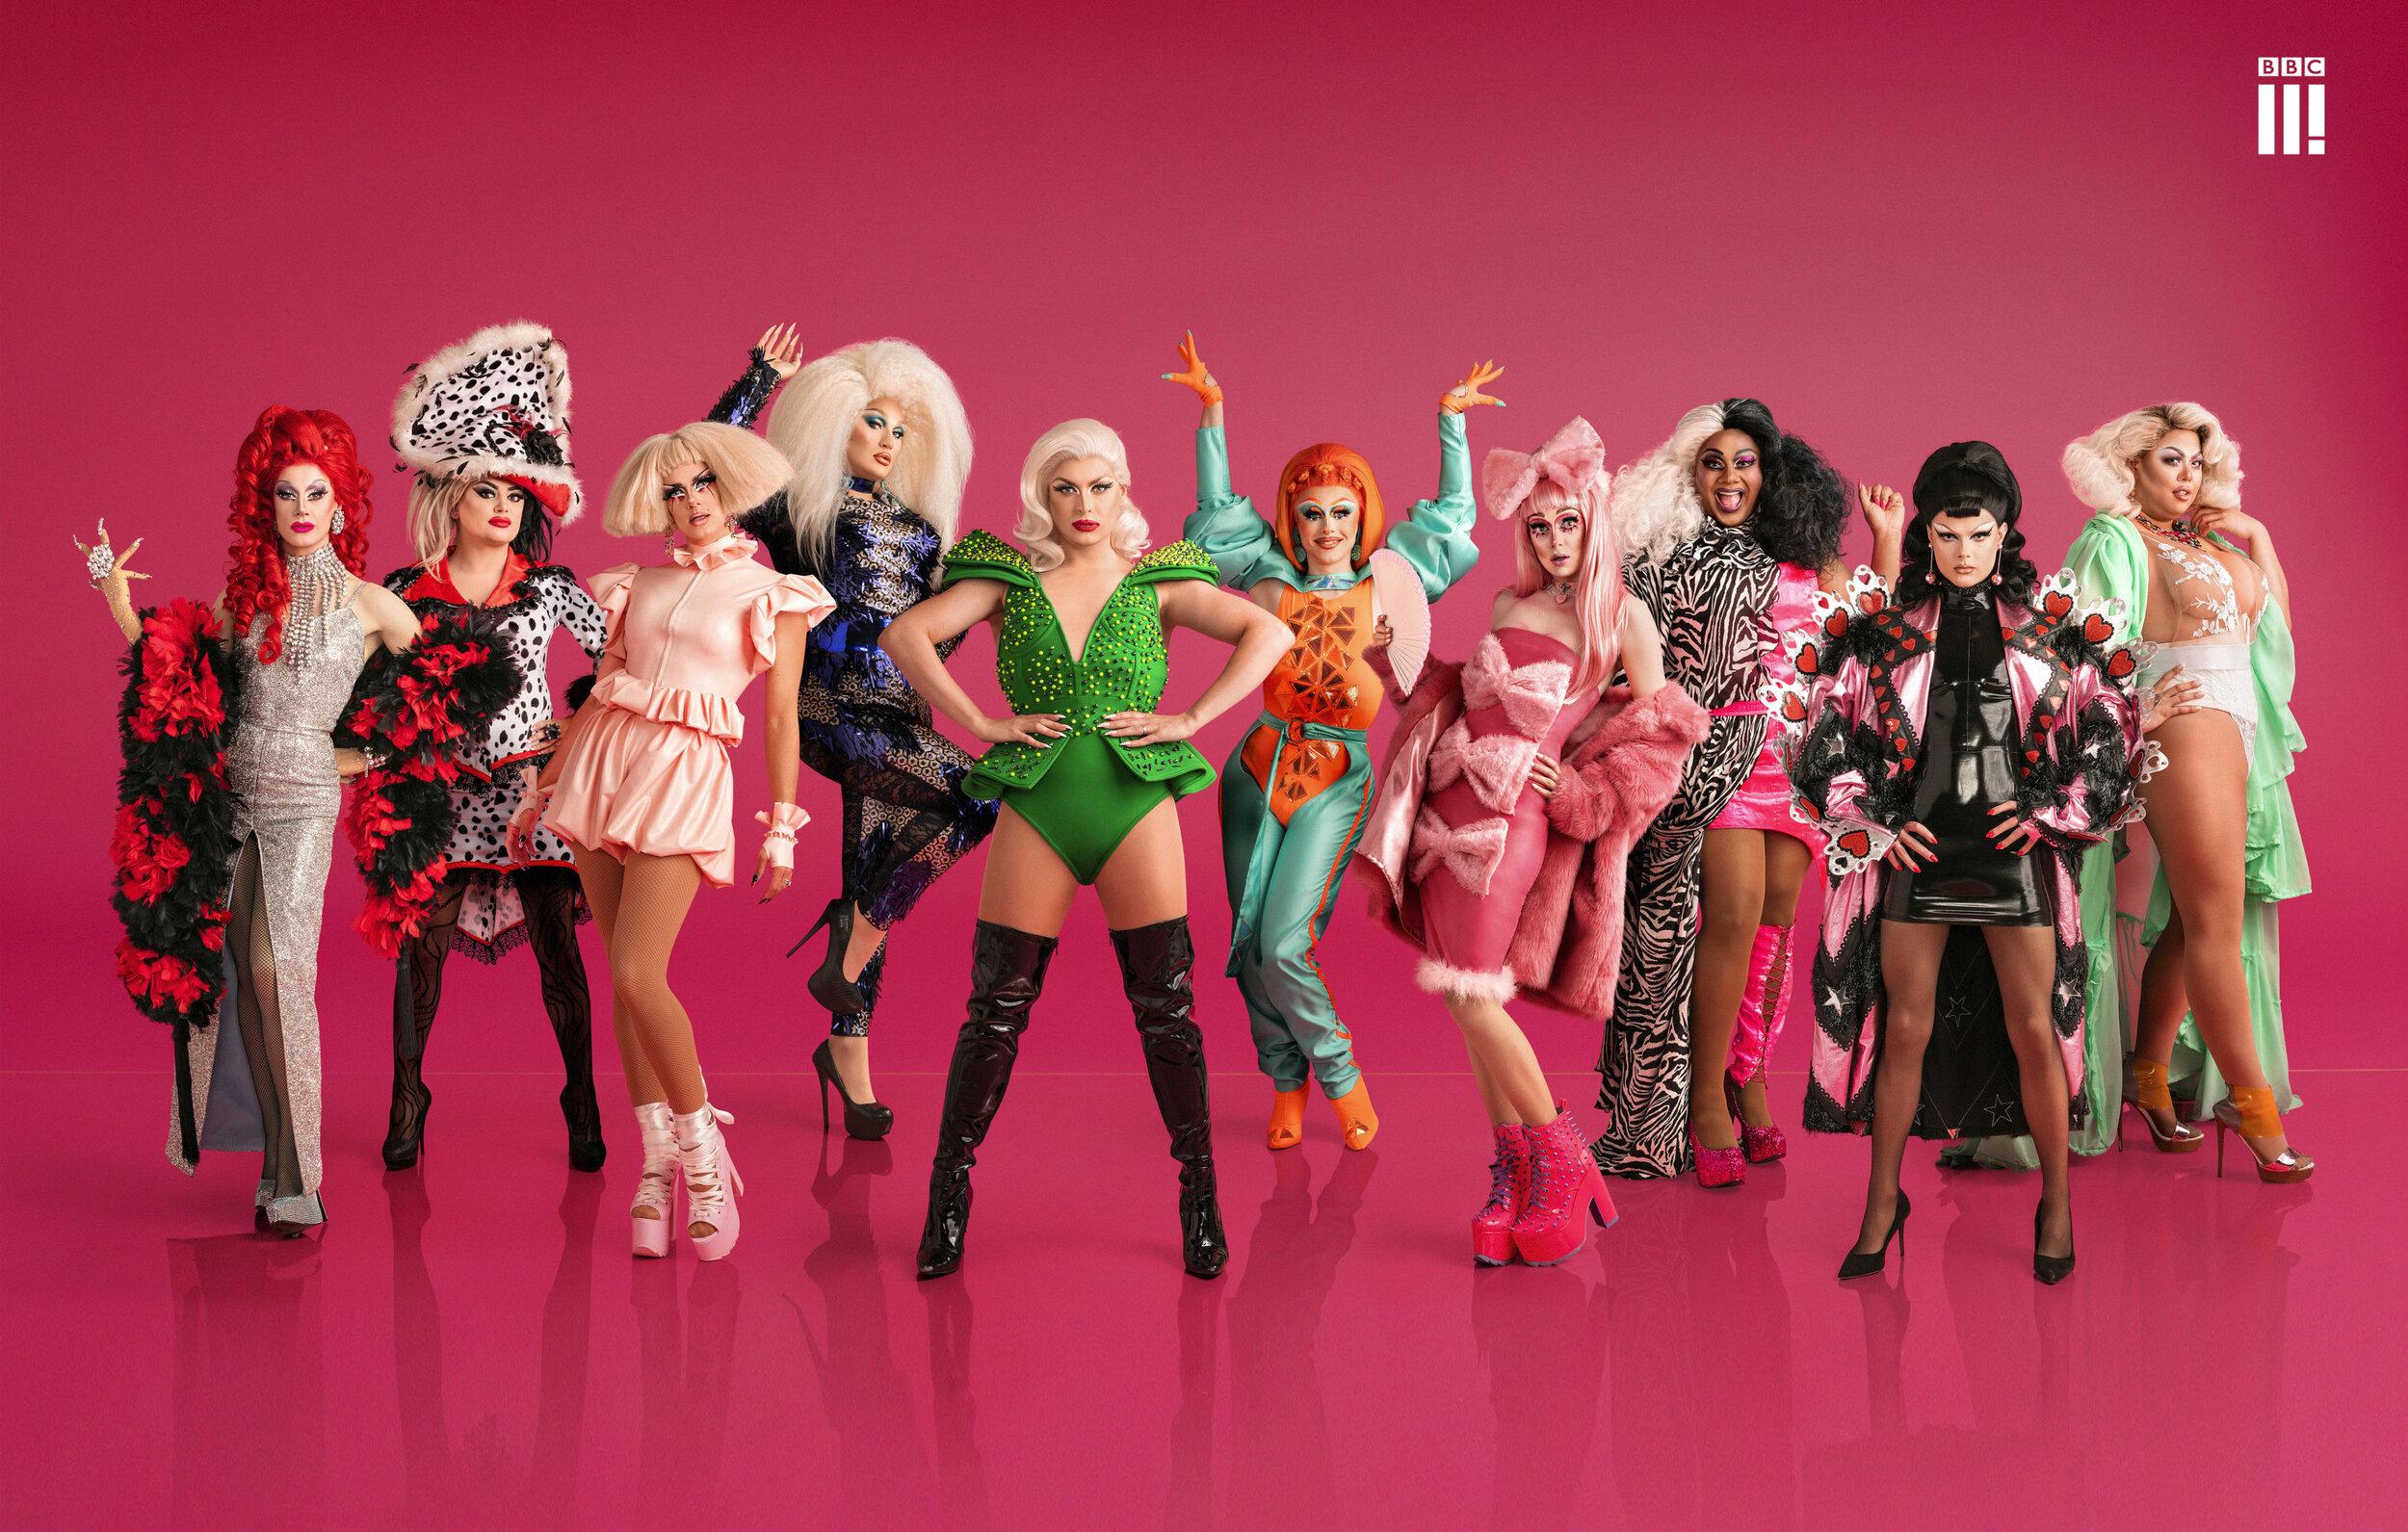 RuPaul's Drag Race UK Season One Promo Art - BBC3